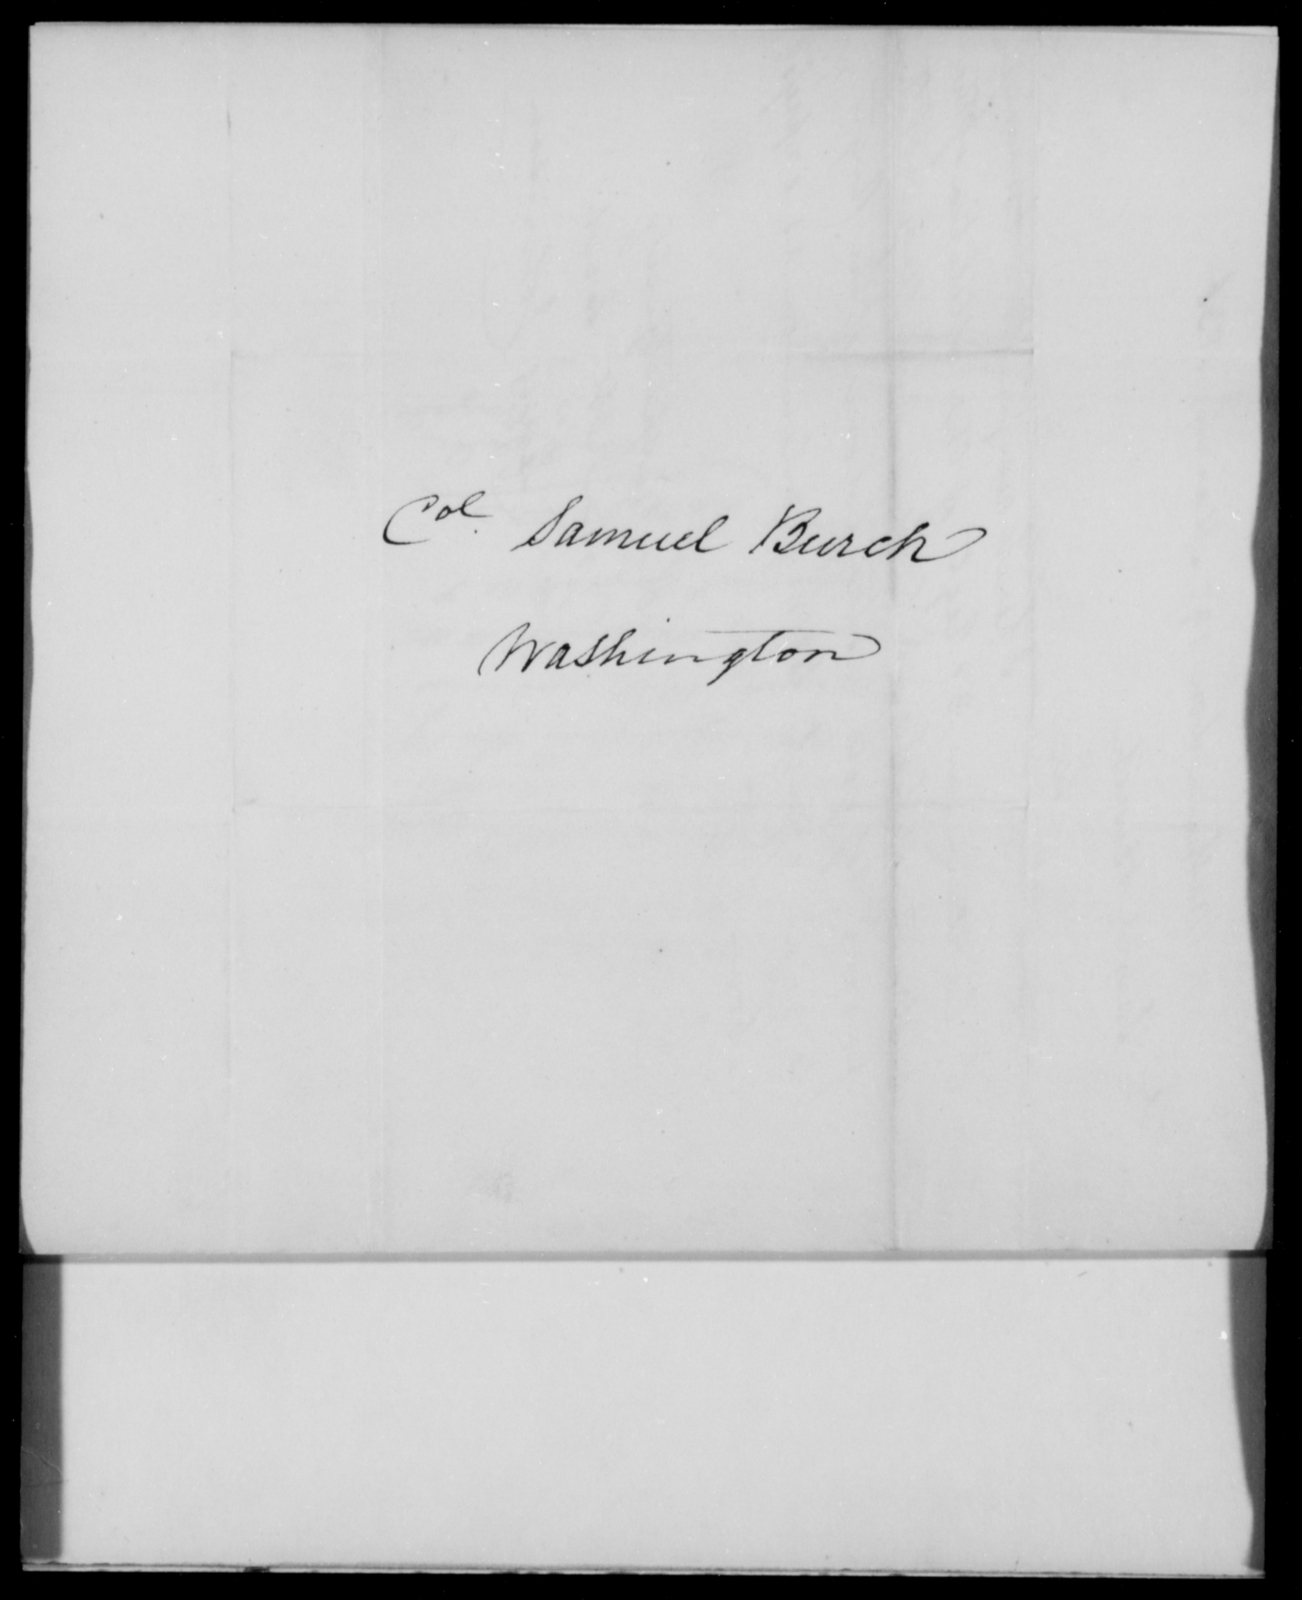 Jouett, Lewis - State: [Blank] - Year: 1831 - File Number: [Blank]